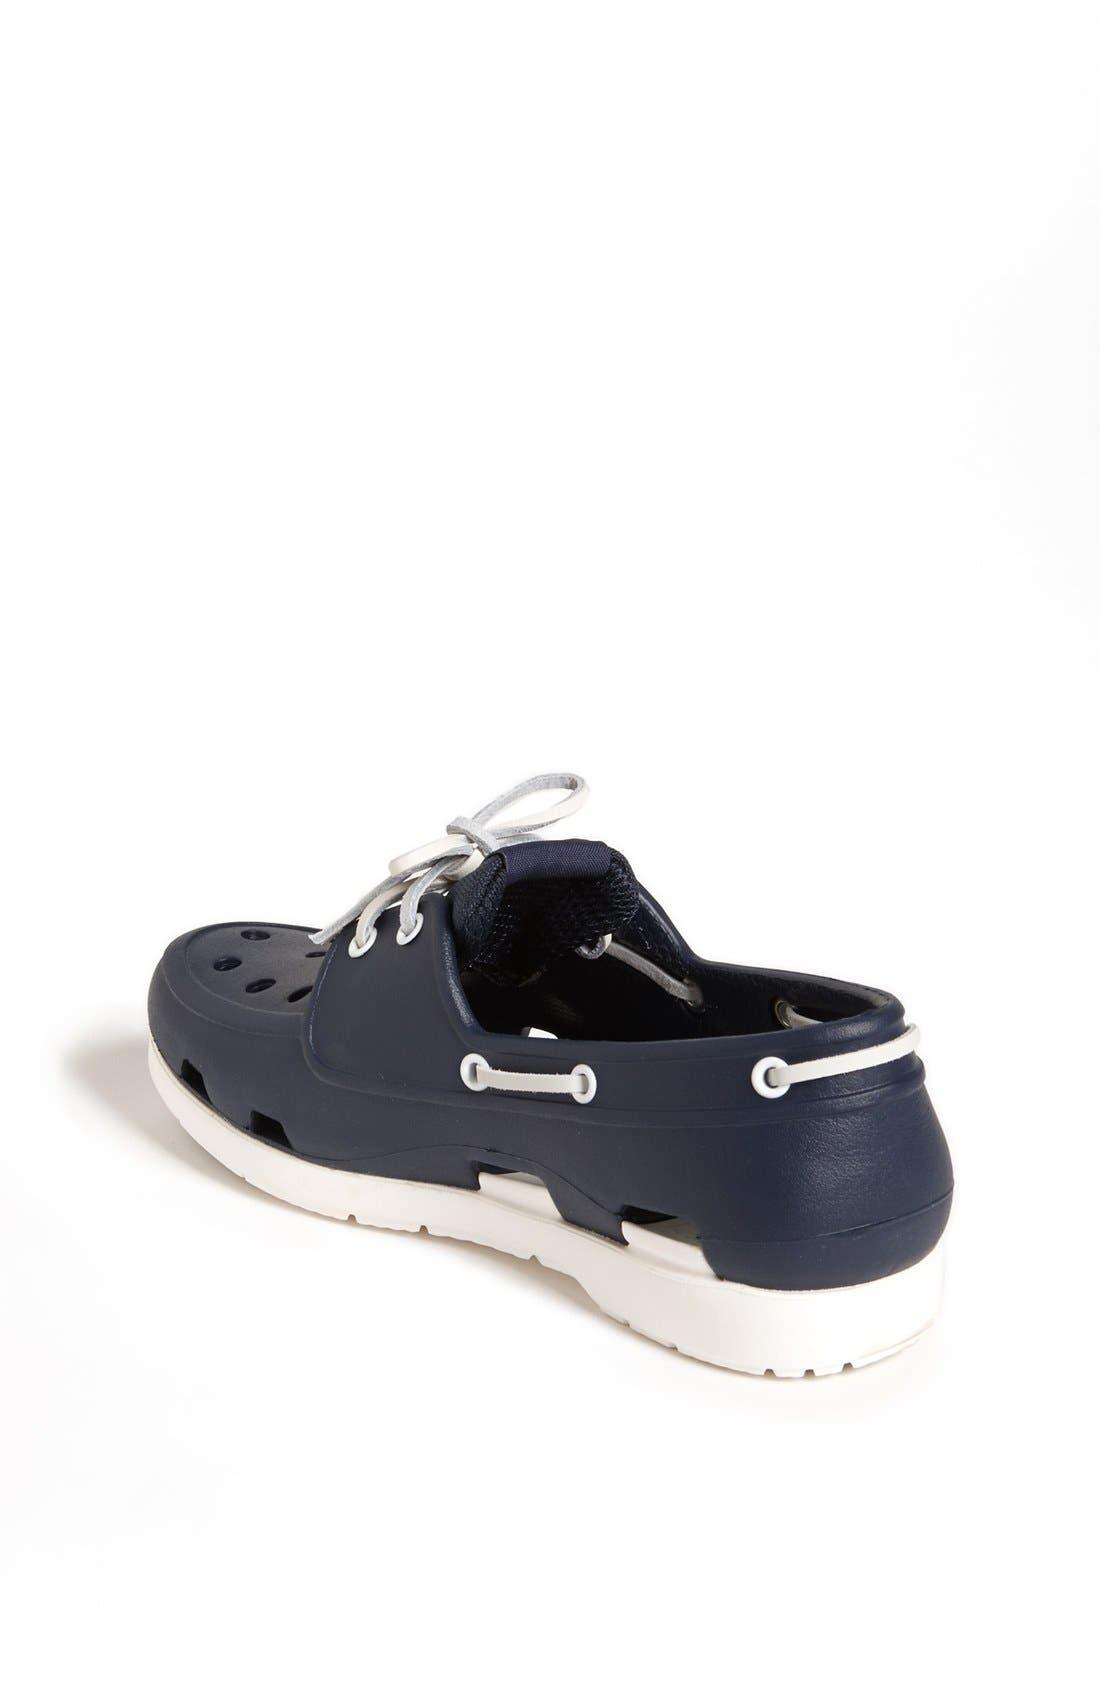 Alternate Image 2  - CROCS™ 'Beach Line' Boat Shoe Clog (Little Kid & Big Kid)